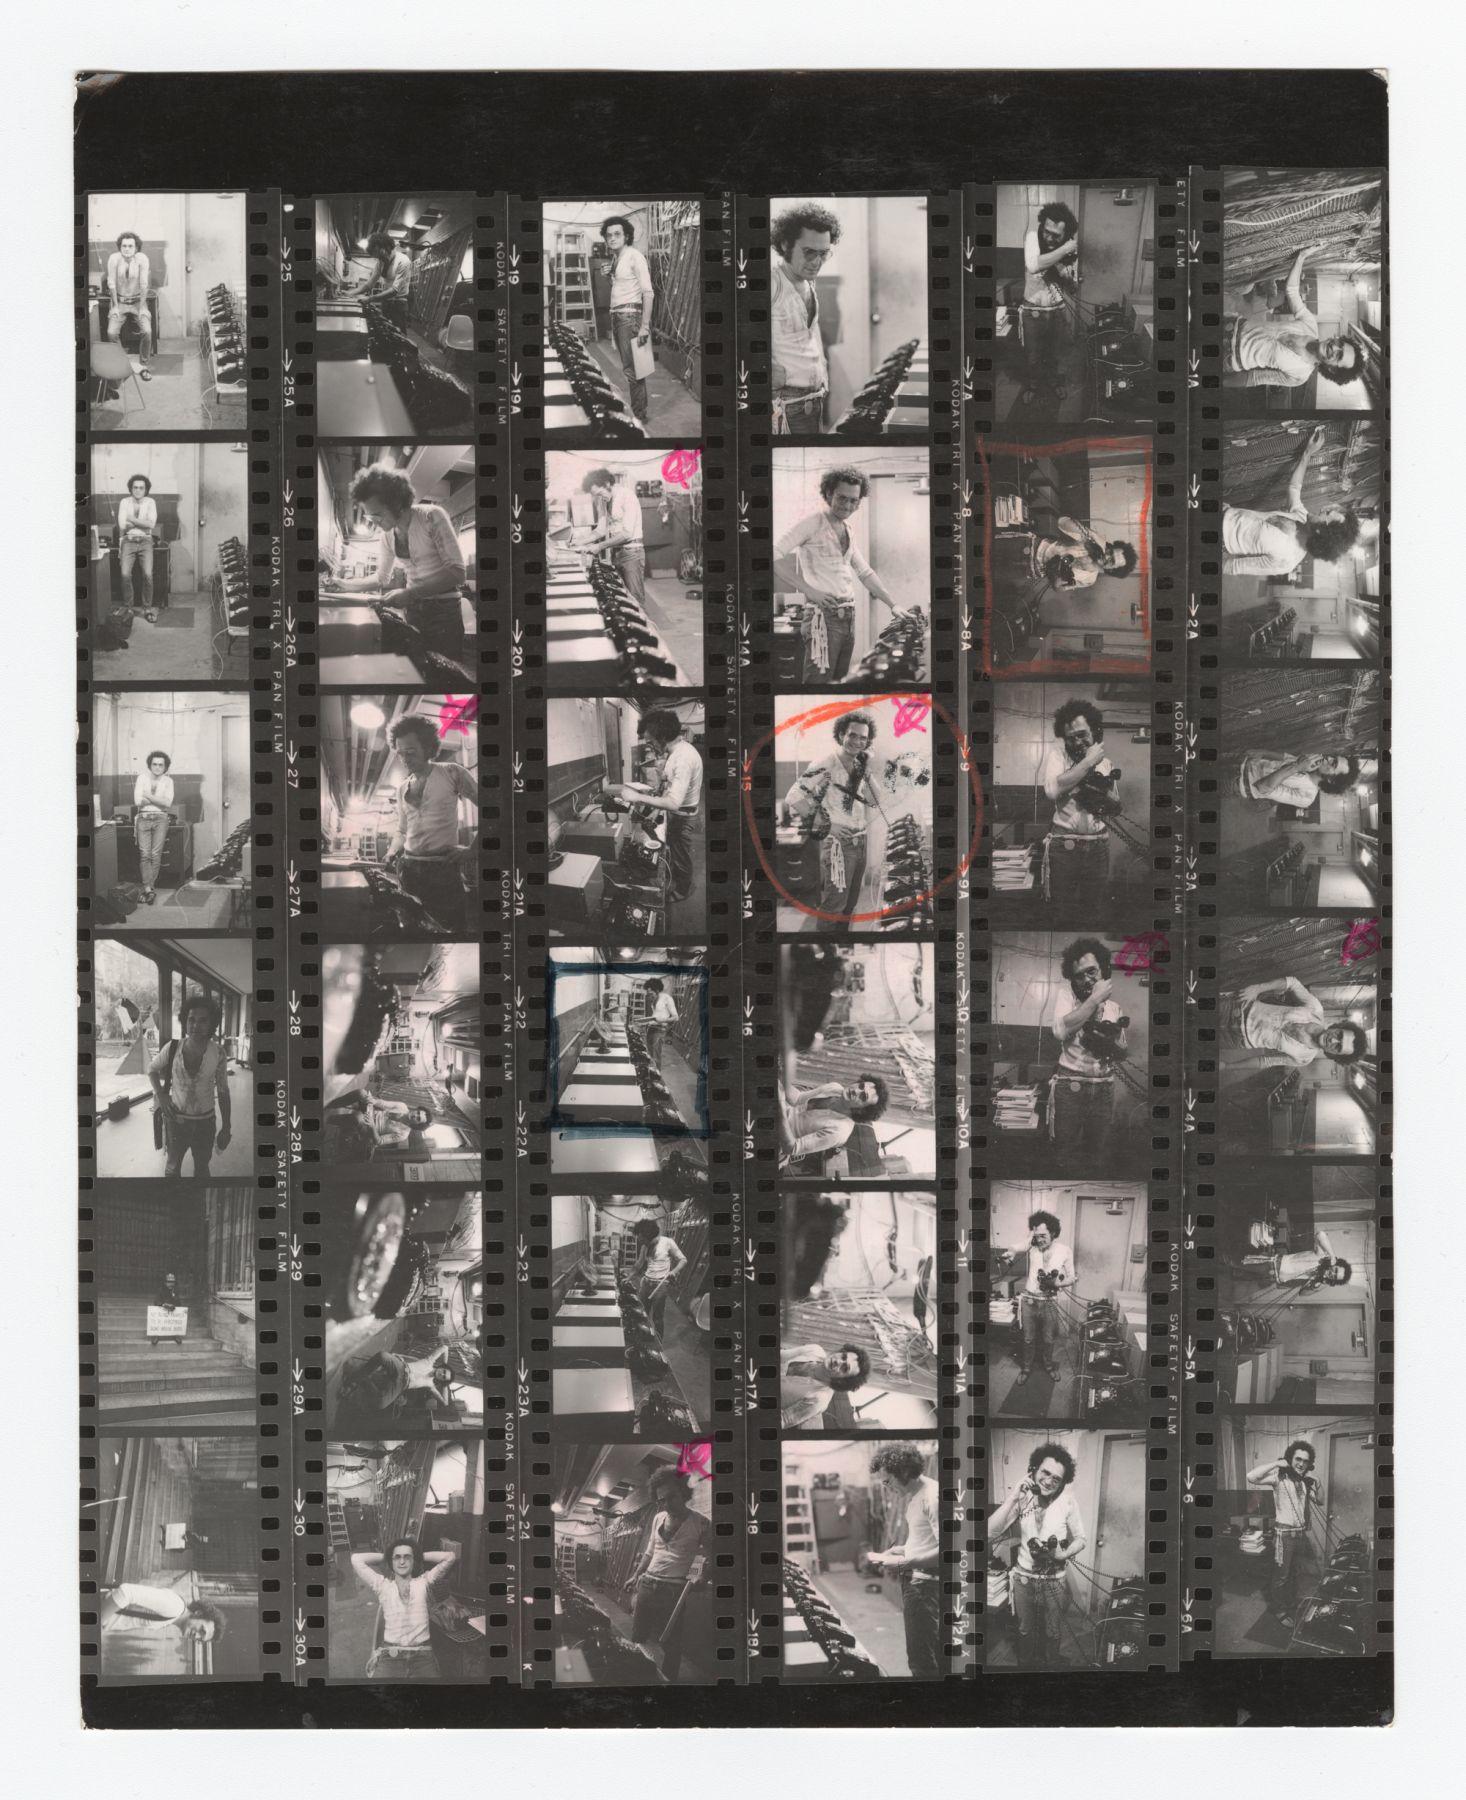 Dial-A-Poem MoMA Contact Sheet, 1970